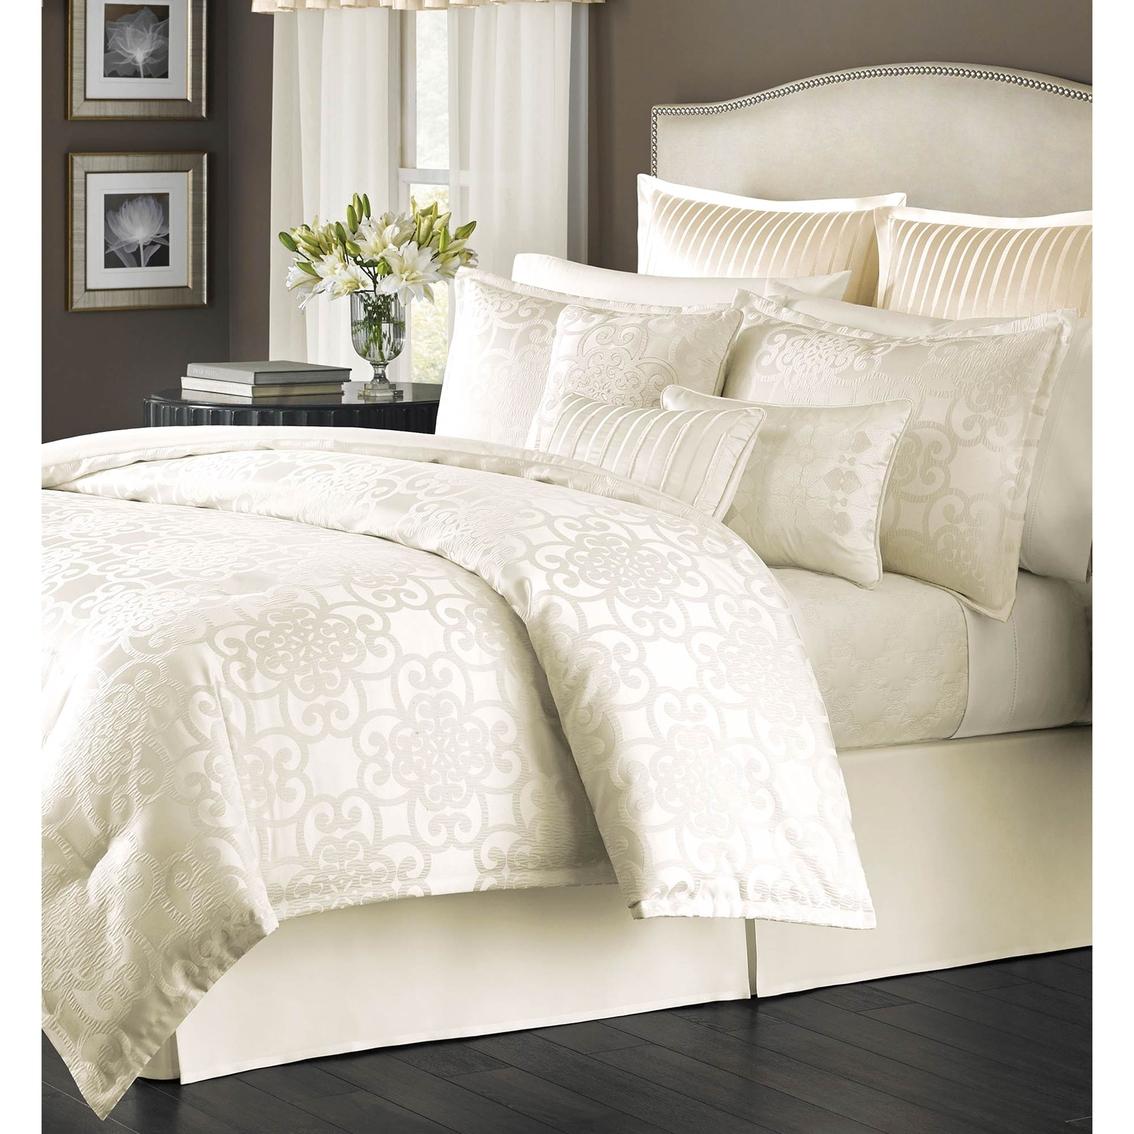 silver chic kitchen amazon home navy sherpa chloe queen comforter dp com set piece